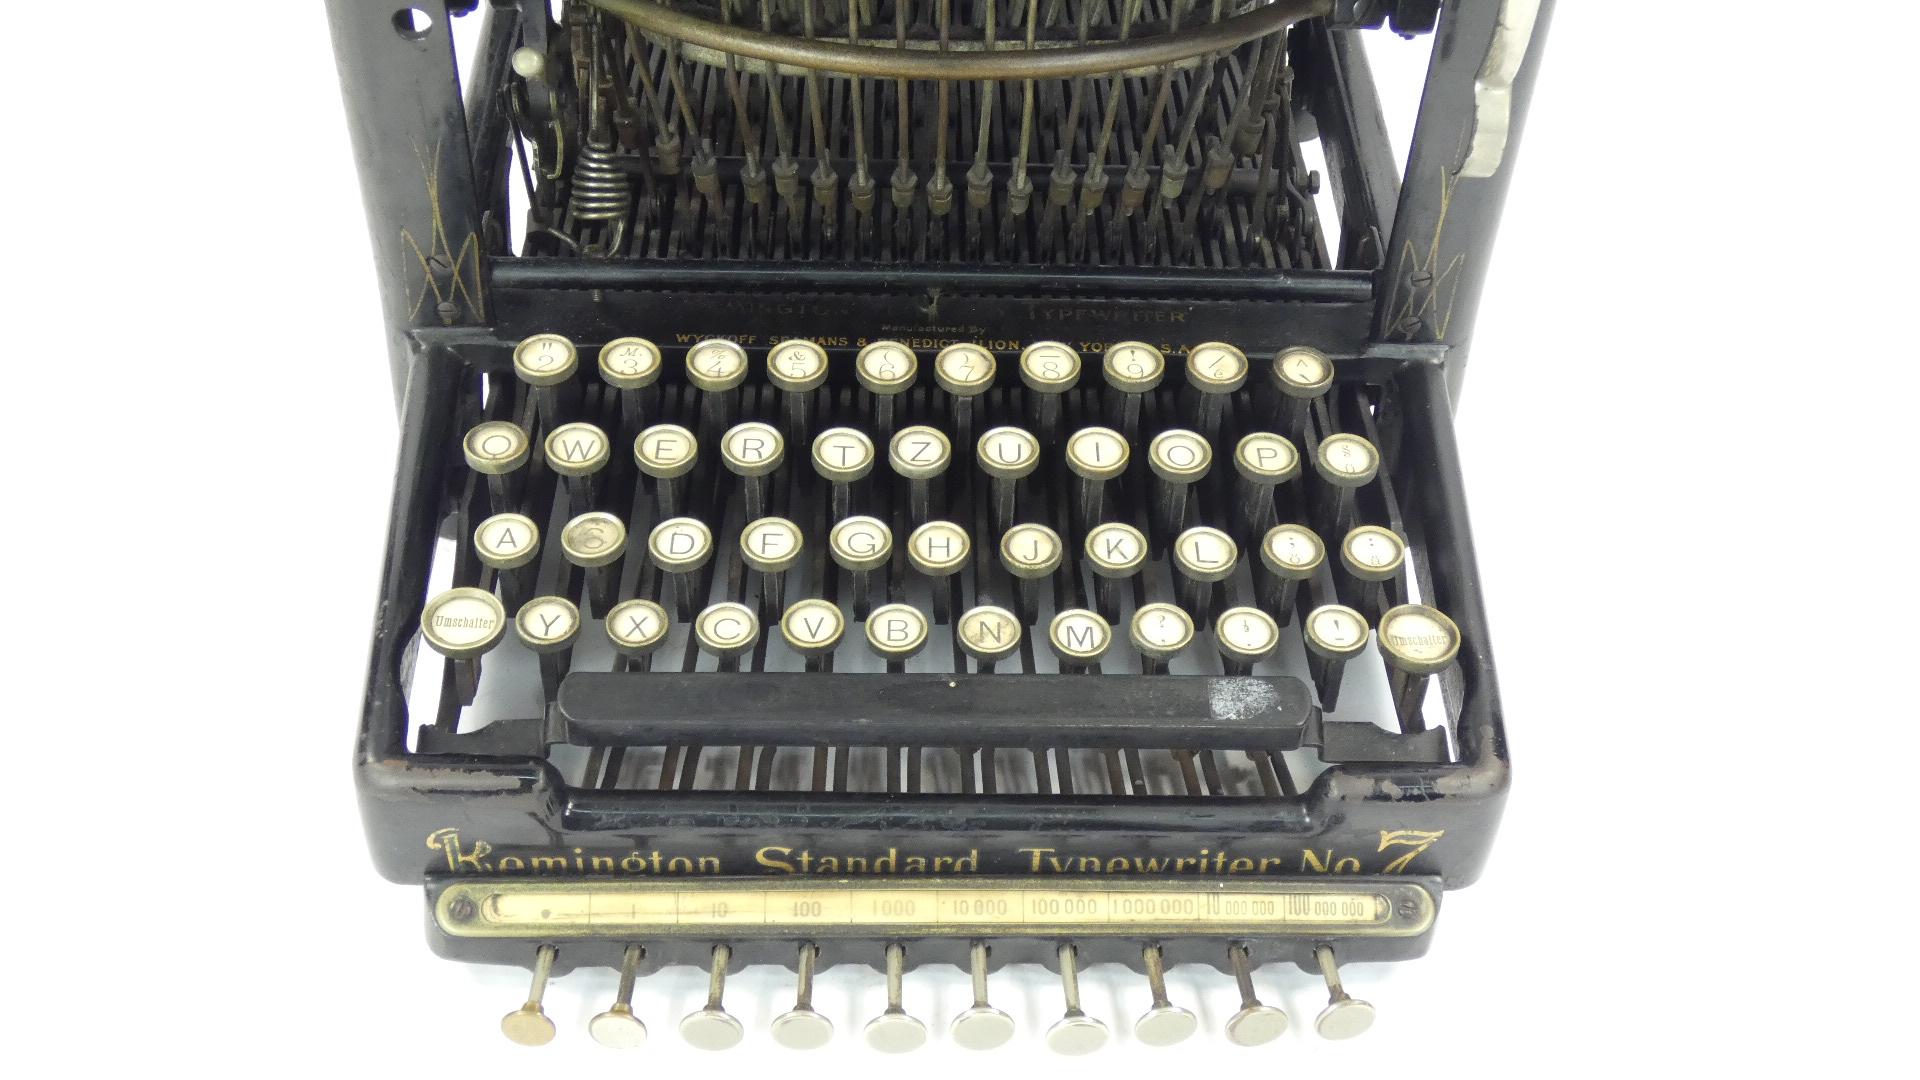 Imagen REMINGTON Nº7 + TABULADOR  AÑO 1898 43421